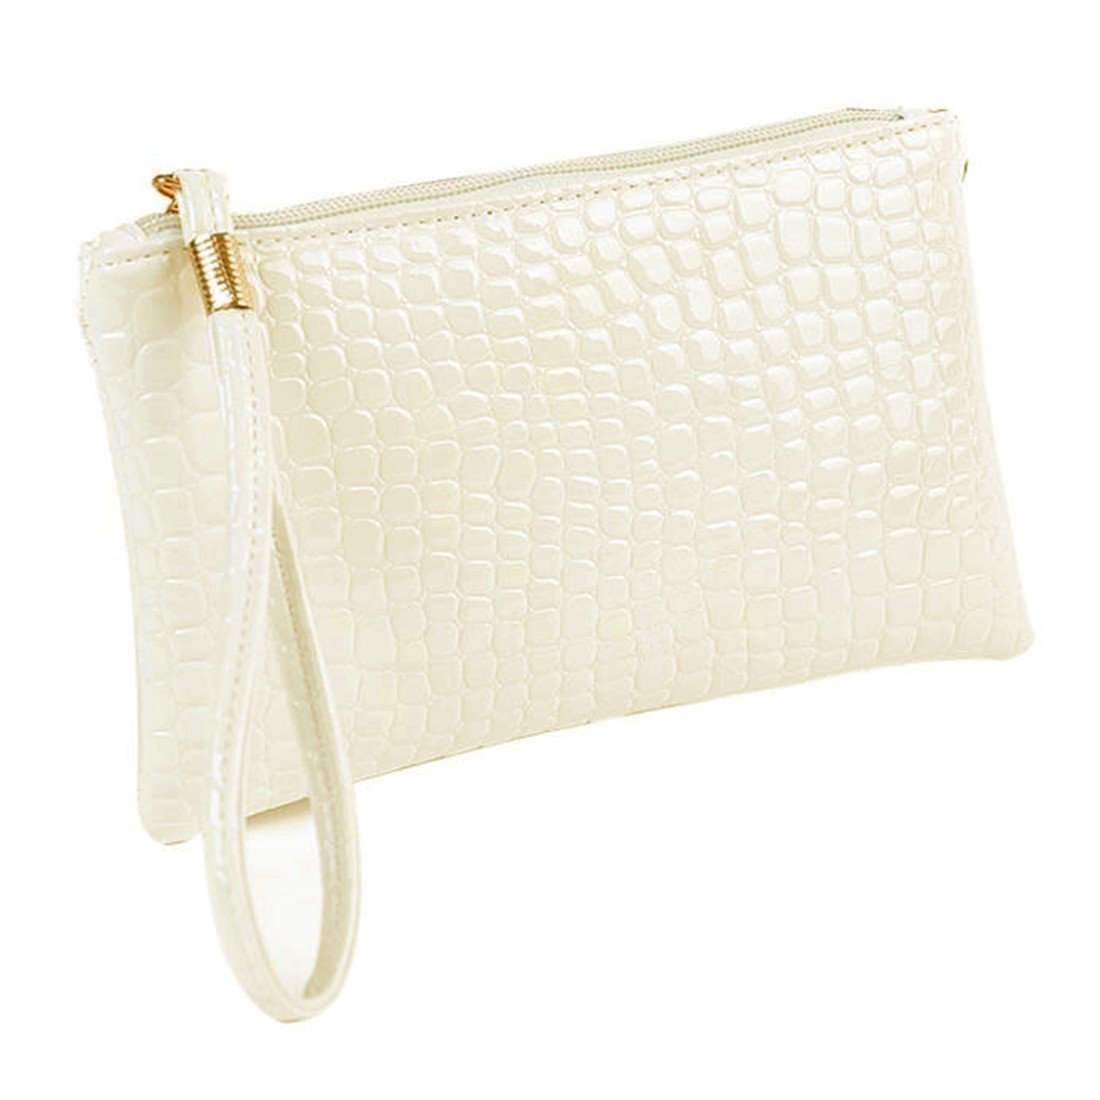 Toponly 小銭入れ レディース クロコダイル レザー クラッチ ハンドバッグ  ファッション ホワイト(Fashion White) B0788WRJJ3